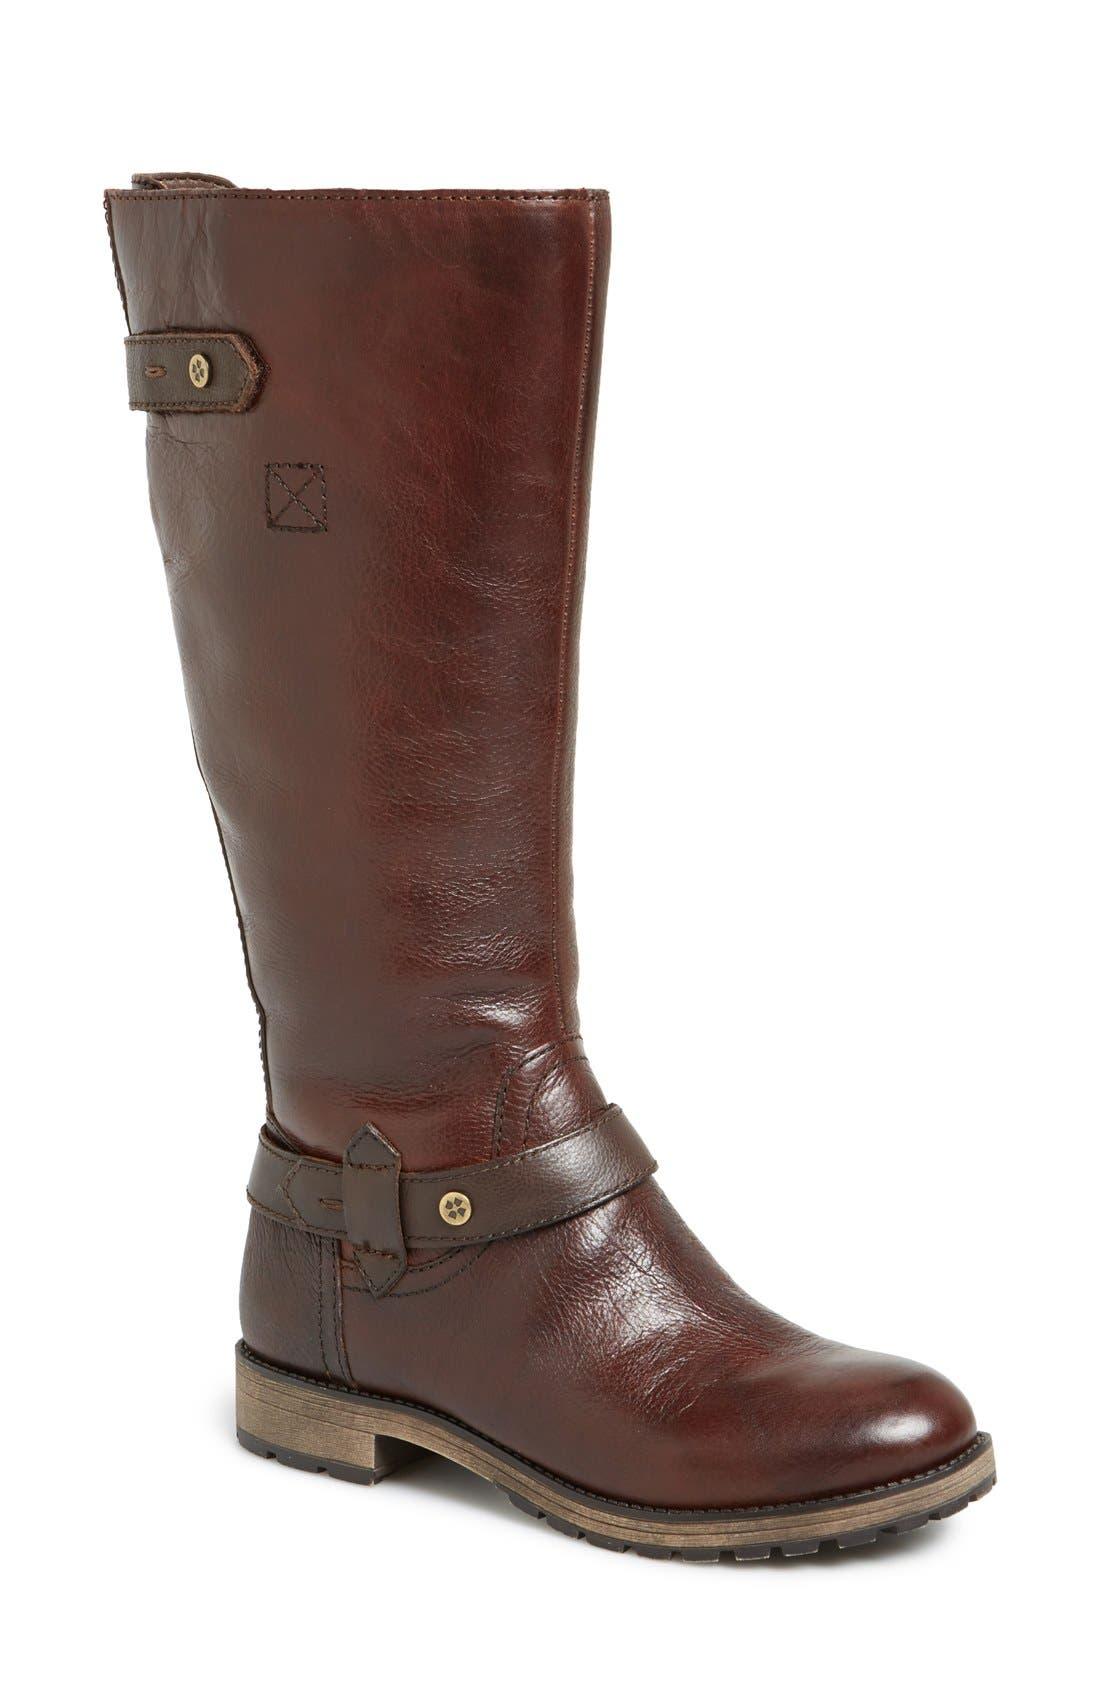 'Tanita' Boot,                             Main thumbnail 1, color,                             Tan Leather